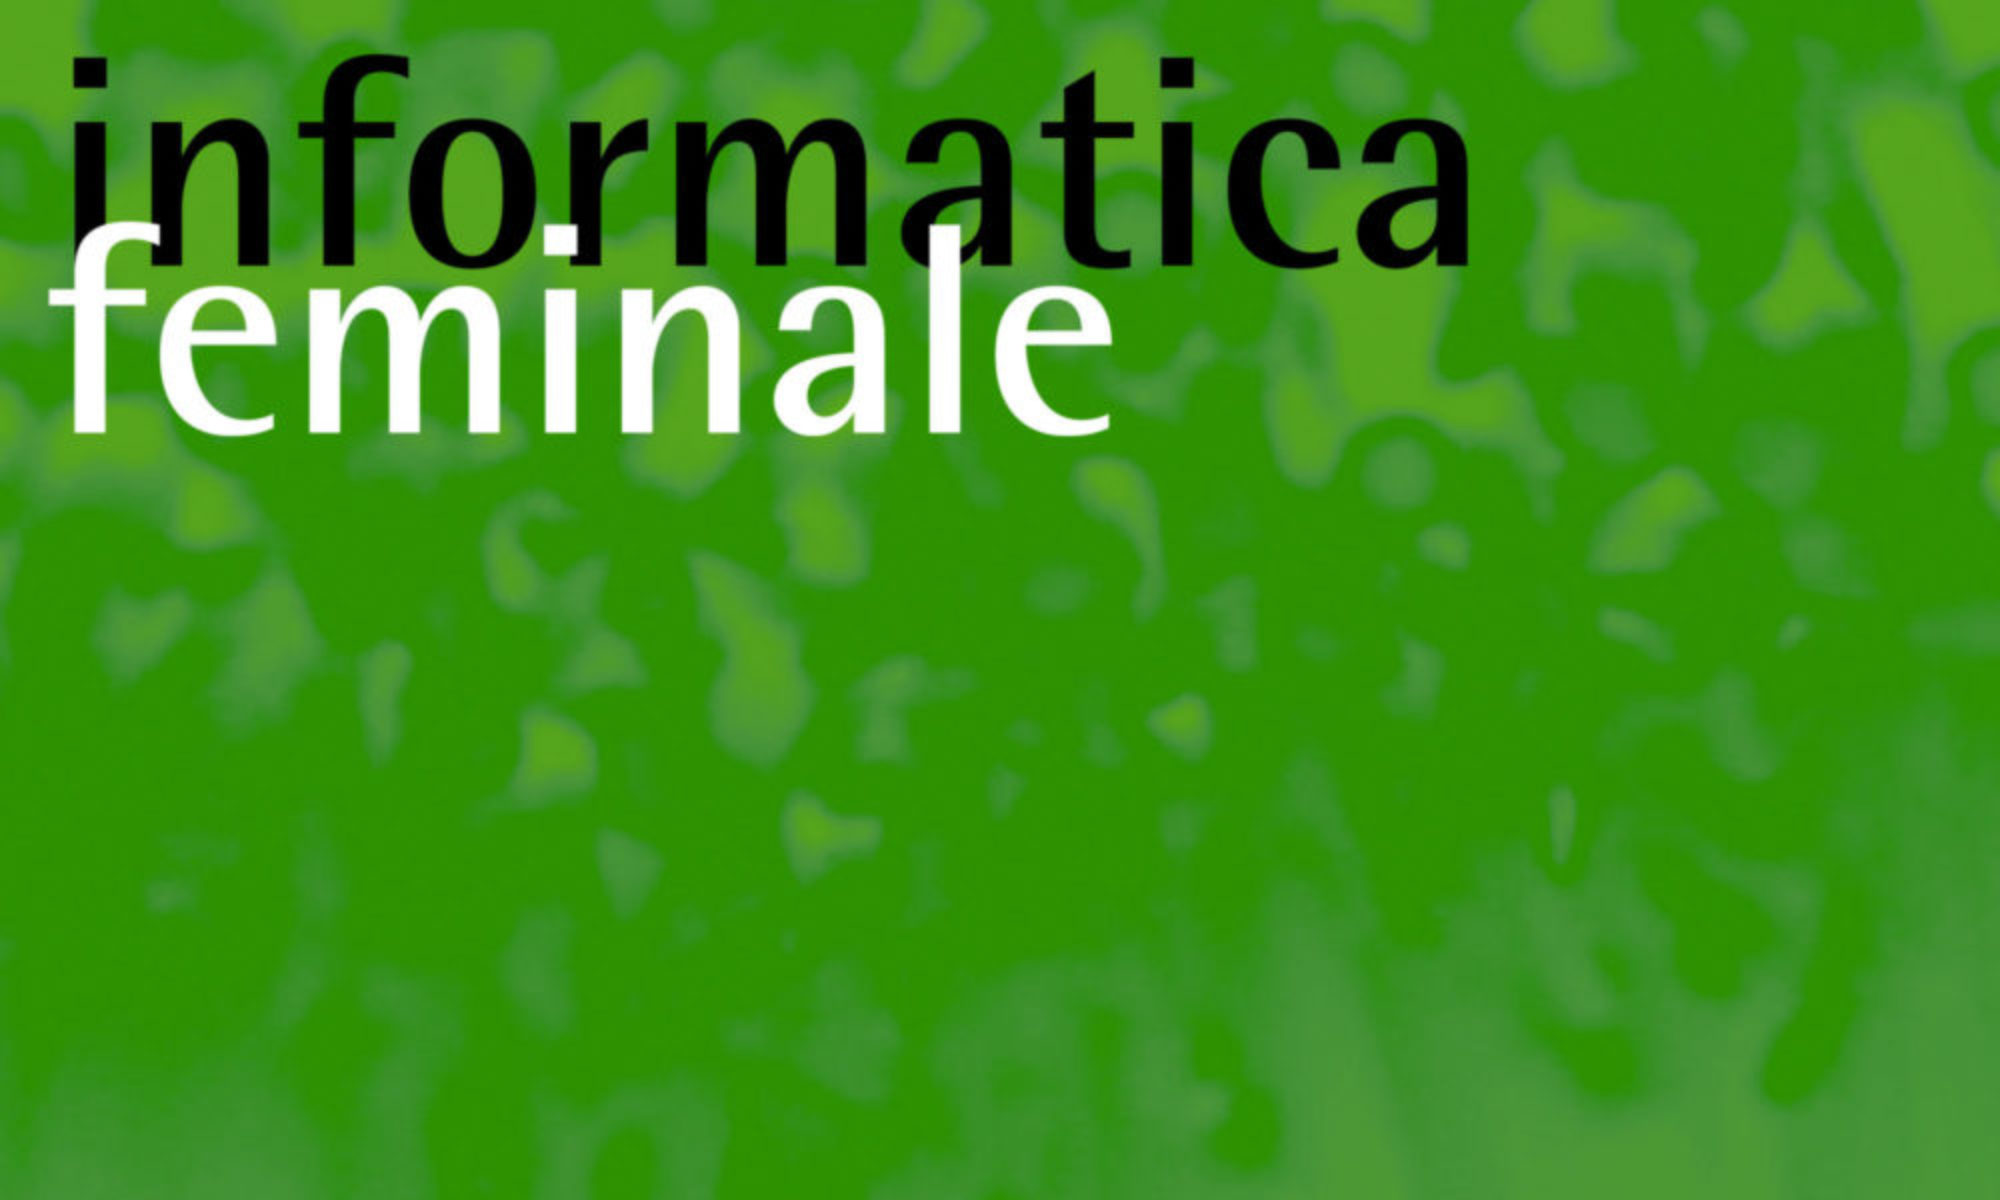 22. Informatica Feminale